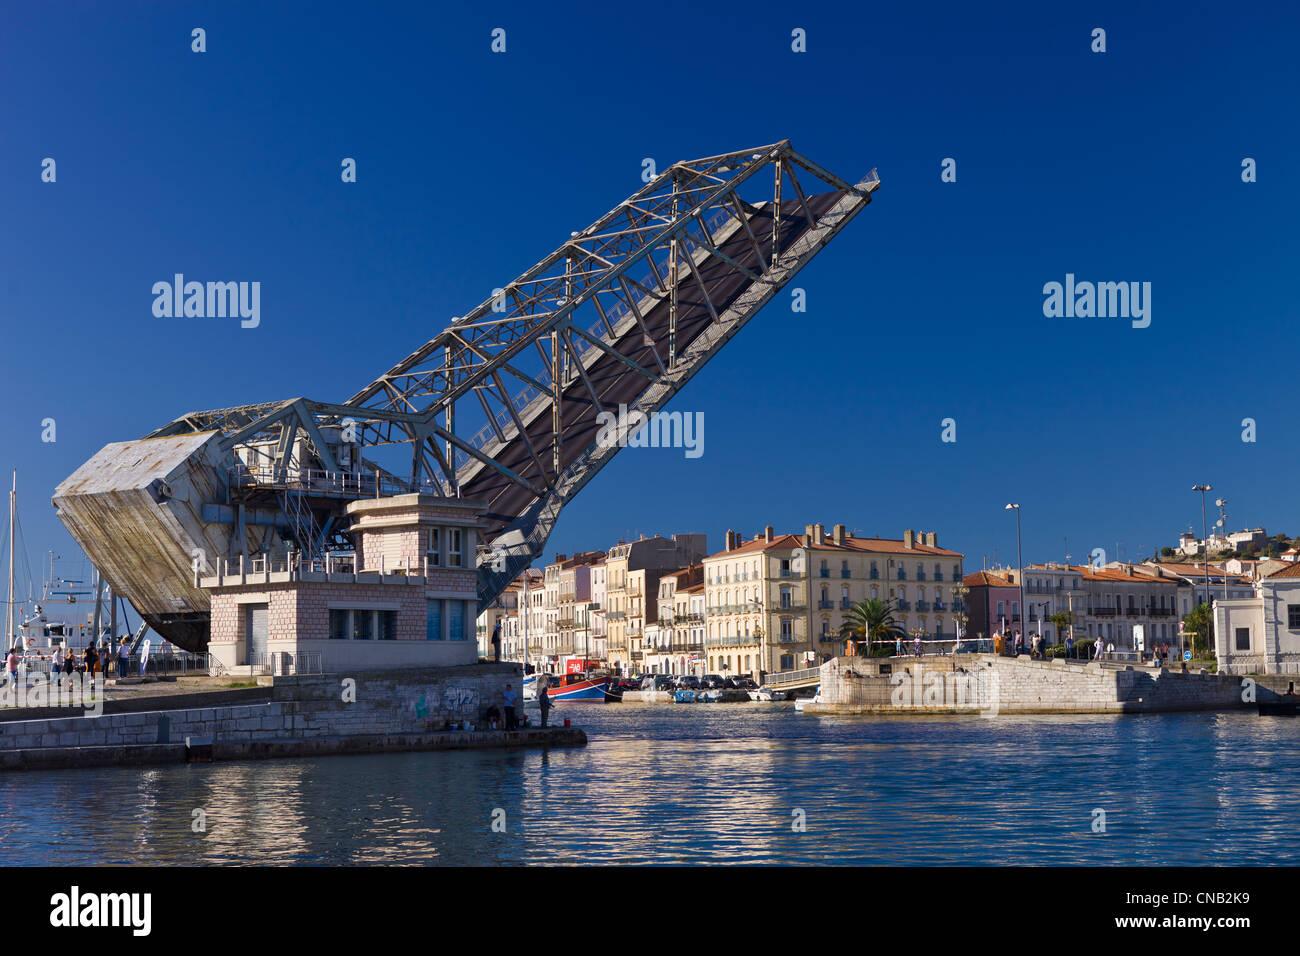 France, Herault, Sete, lift bridge of Tivoli, sailing boats passing through - Stock Image